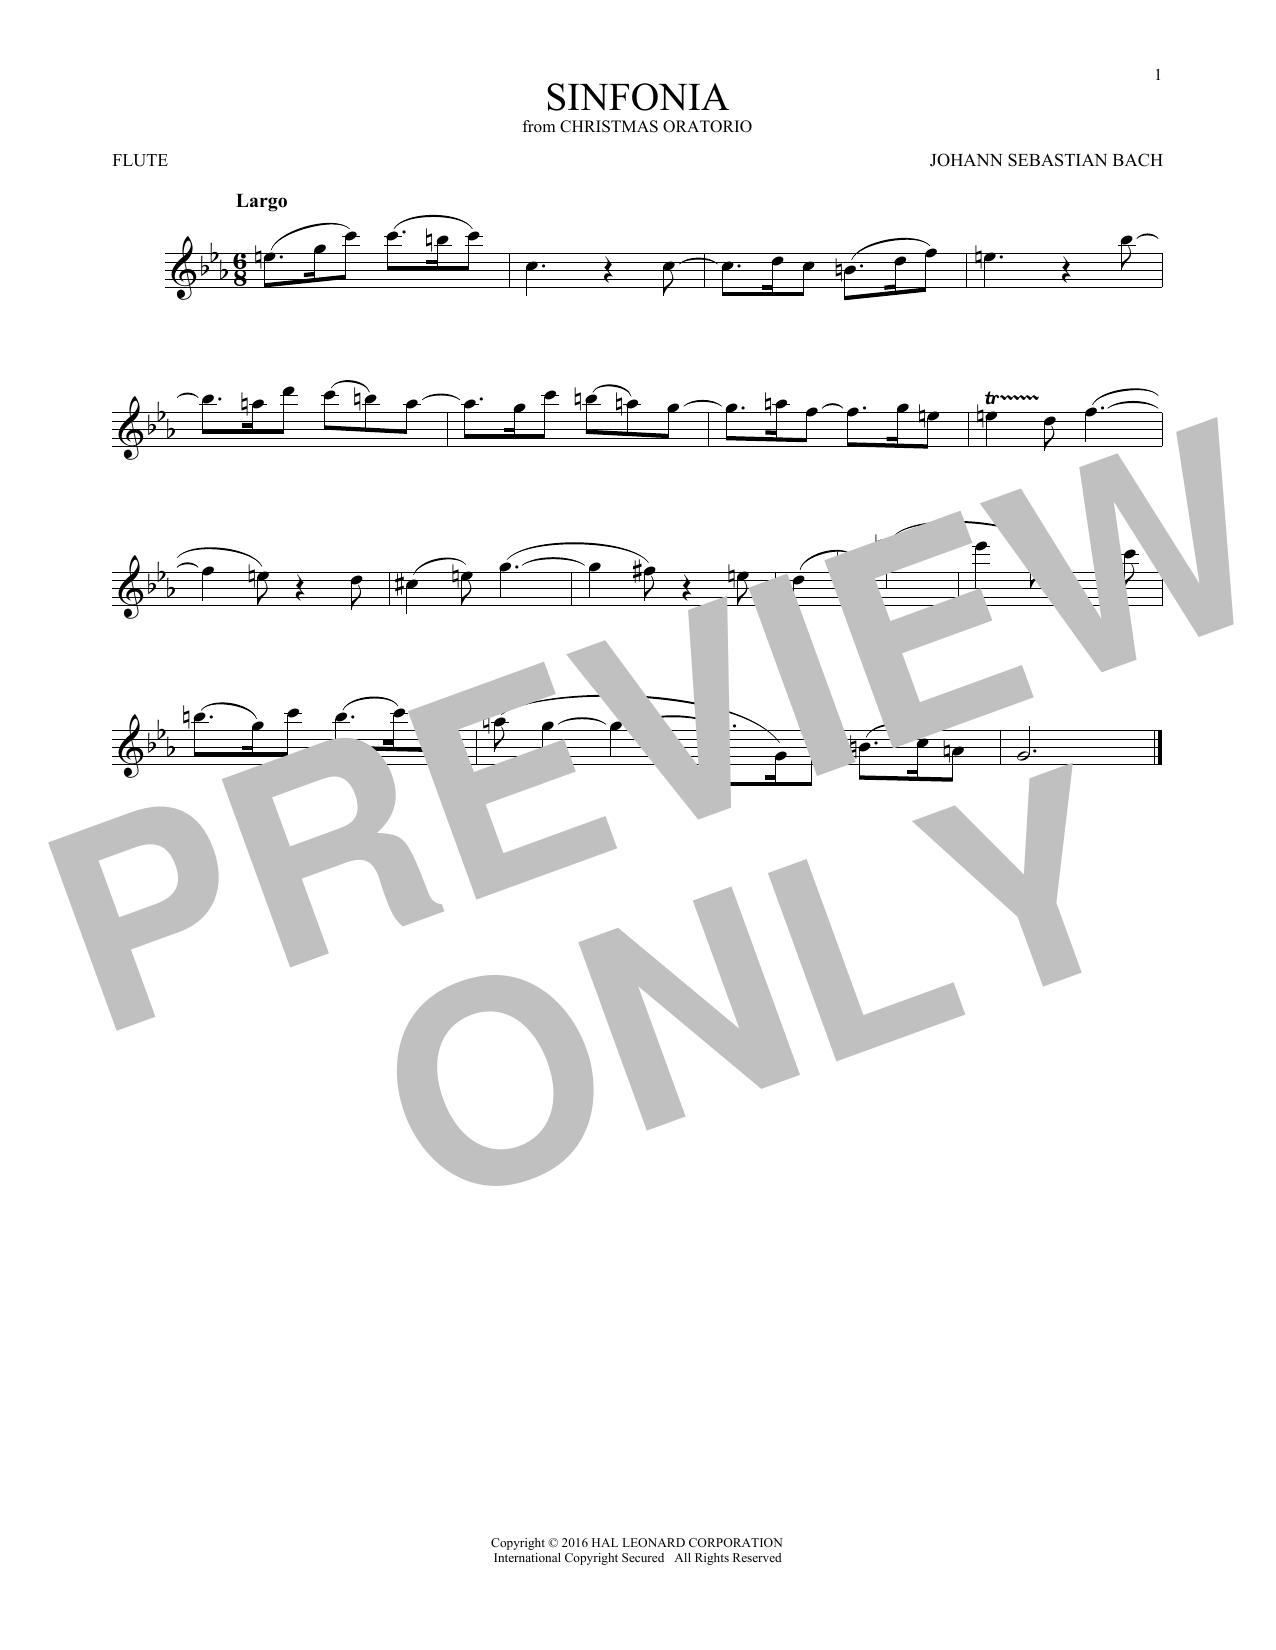 Sinfonia (Flute Solo)